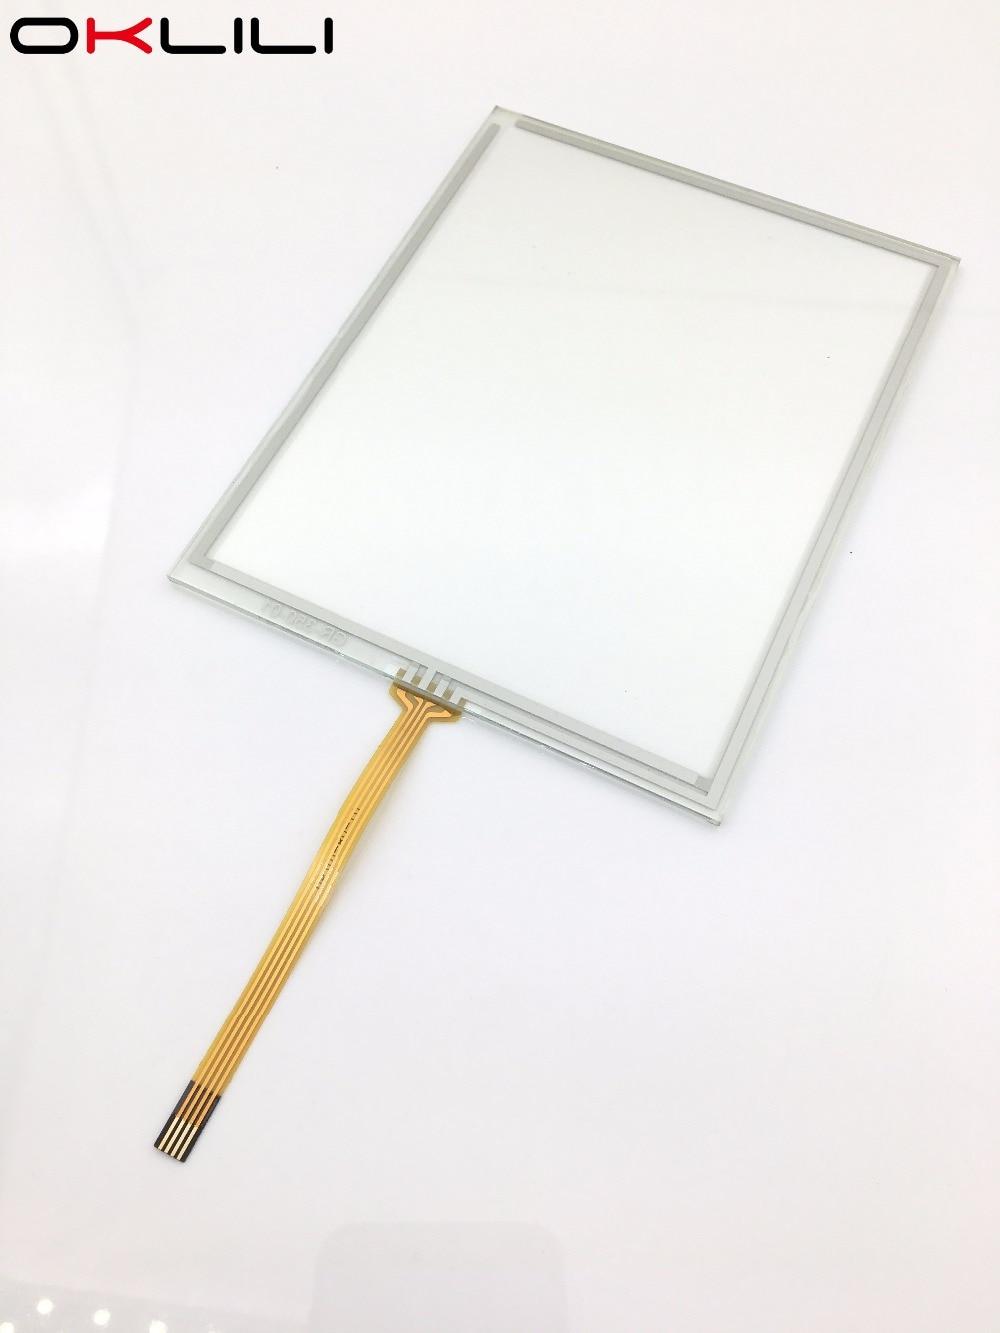 1X 4040-7809-01 LCD Touch Screen Panel for Konica Minolta Bizhub 200 222 250 282 350 362 BH200 BH250 BH350 for NEC IT2530 IT3530 nec um330w